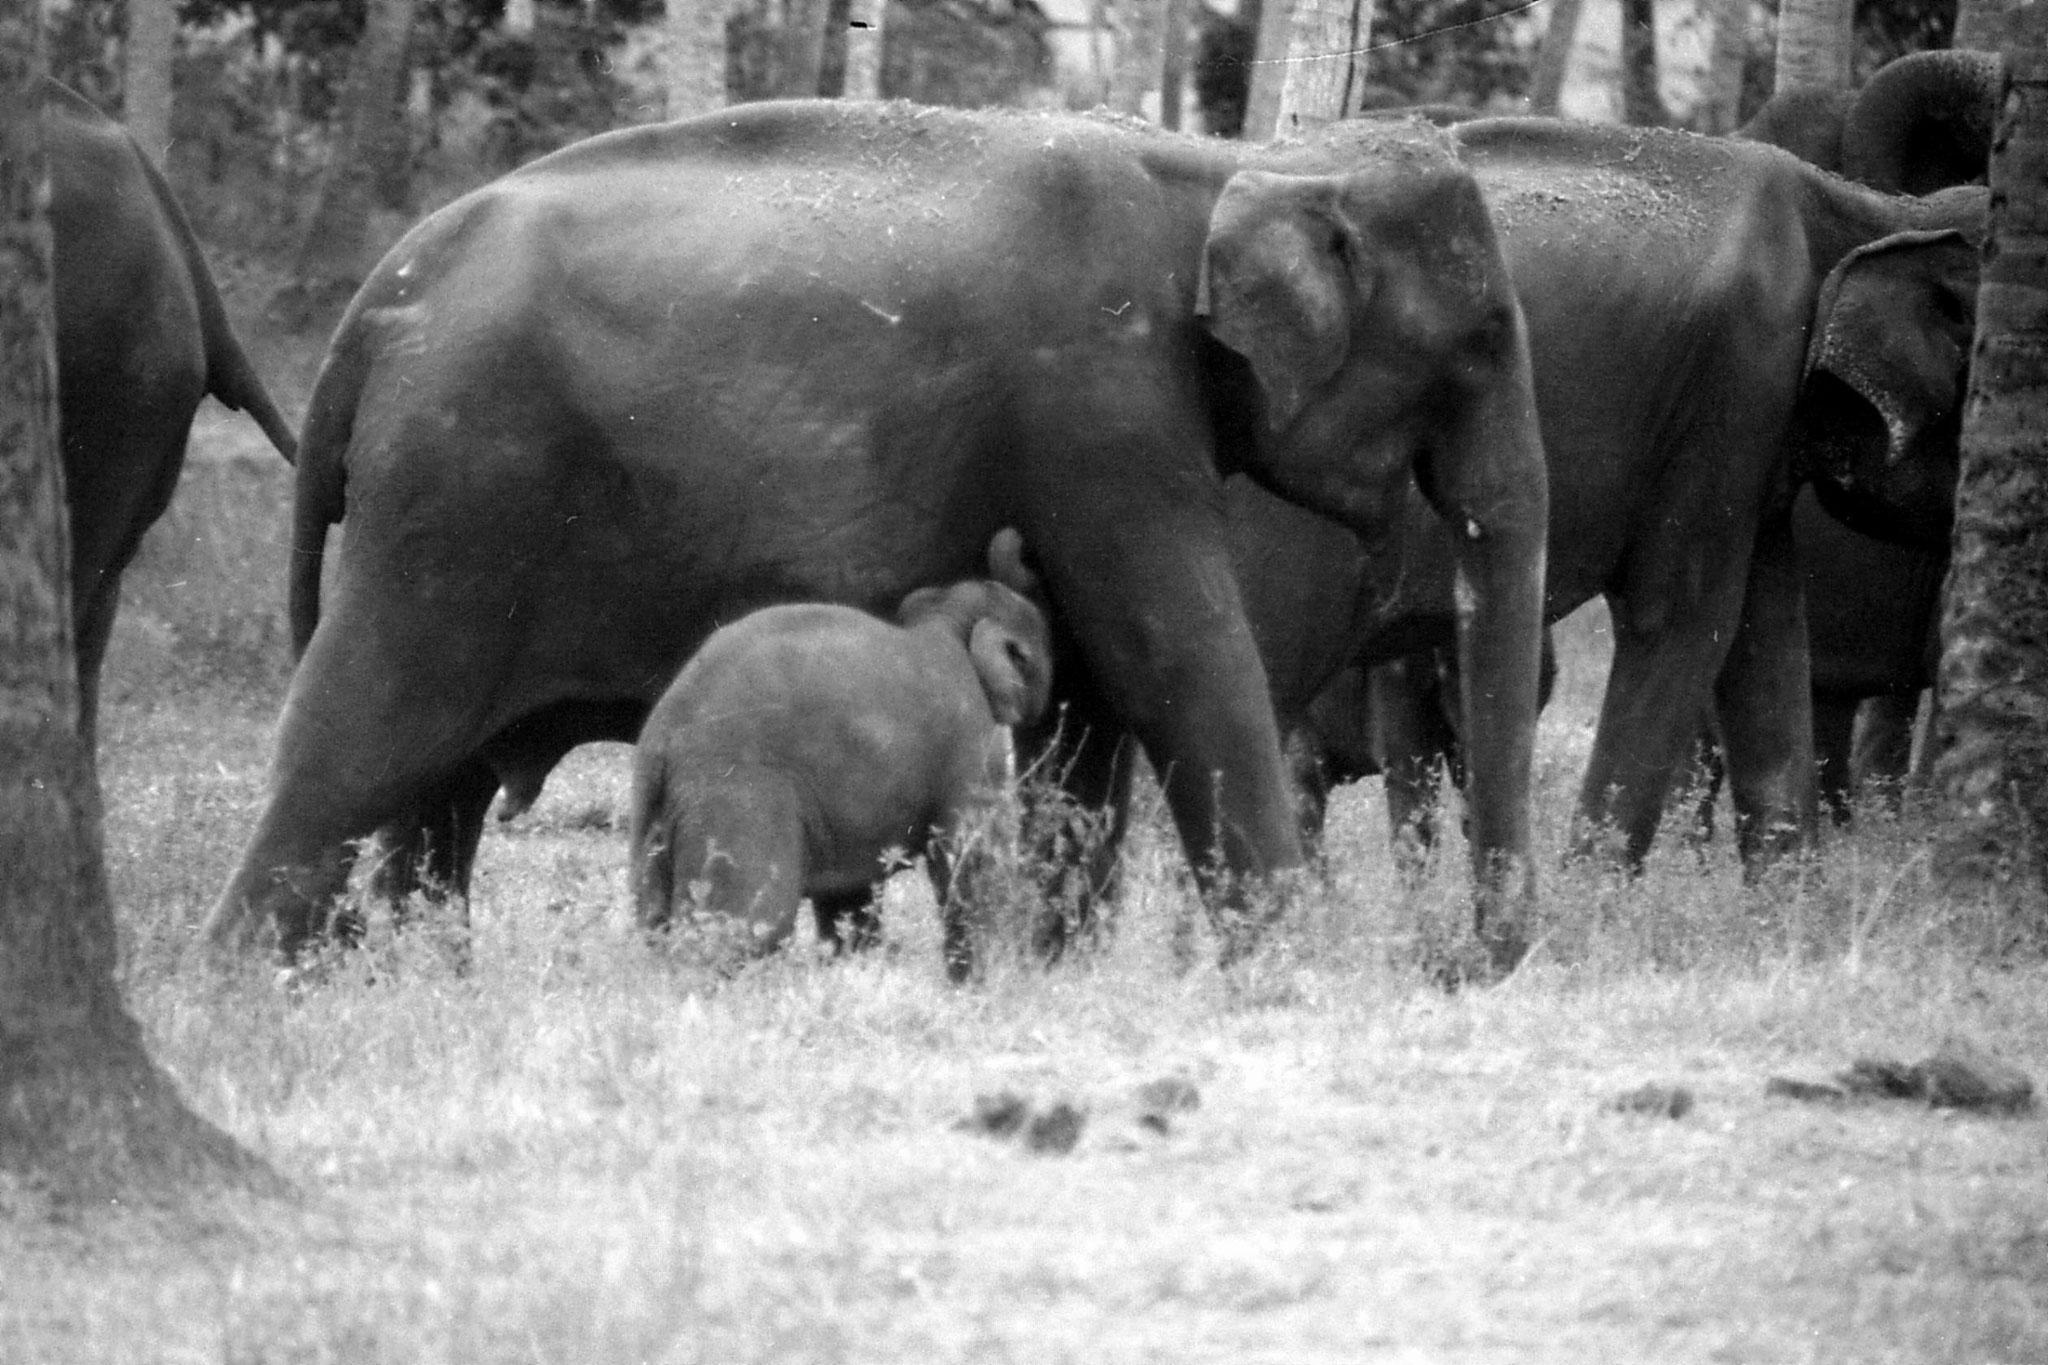 10/2/90: 34: Kegalla elephant orphanage